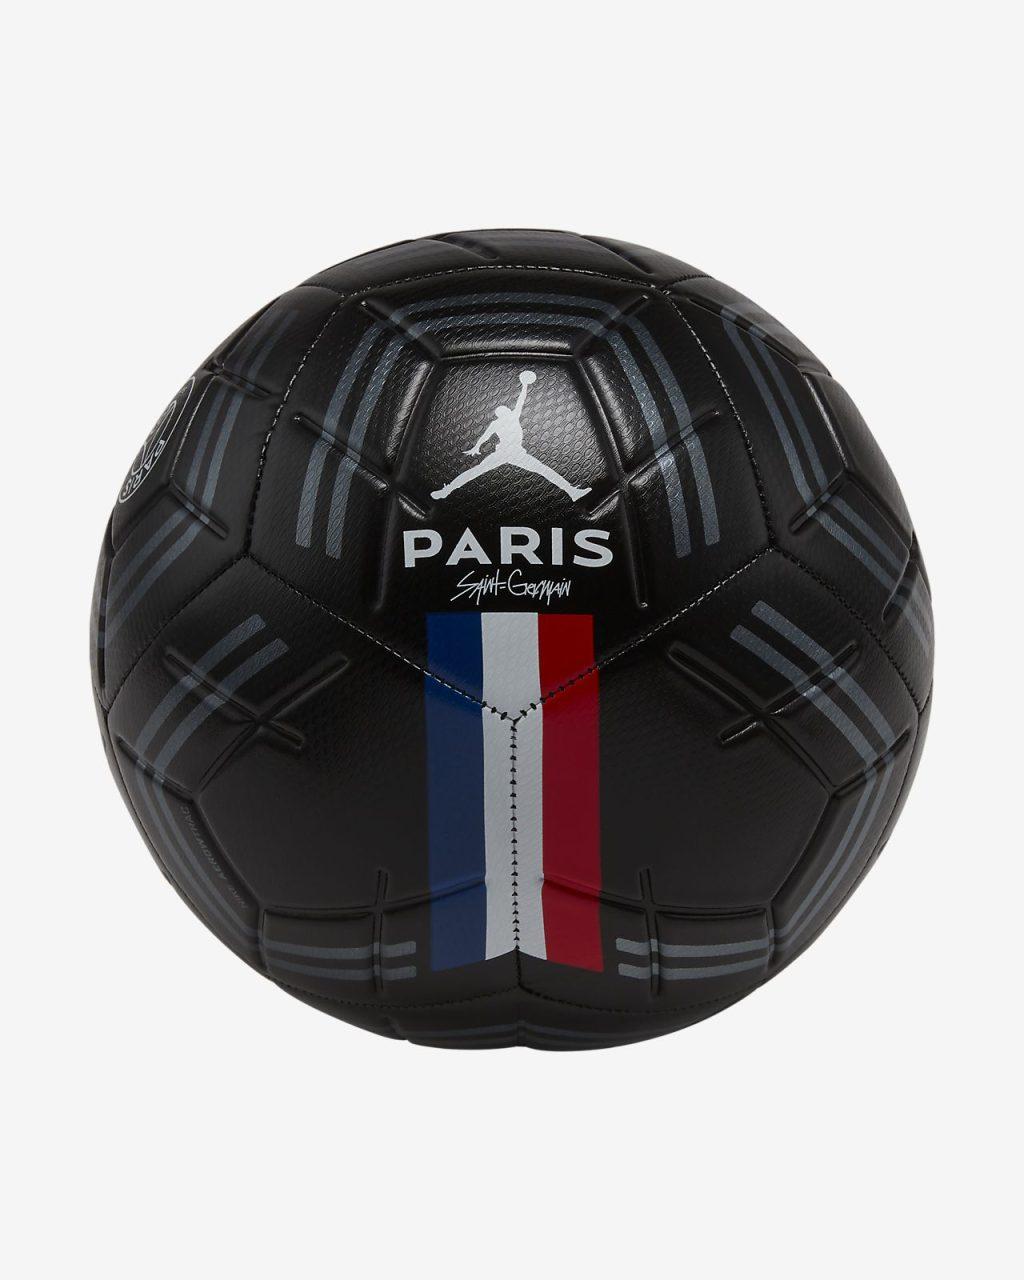 nike-jordan-brand-paris-saint-germain-2019-20-fourth-kit-release-20200128